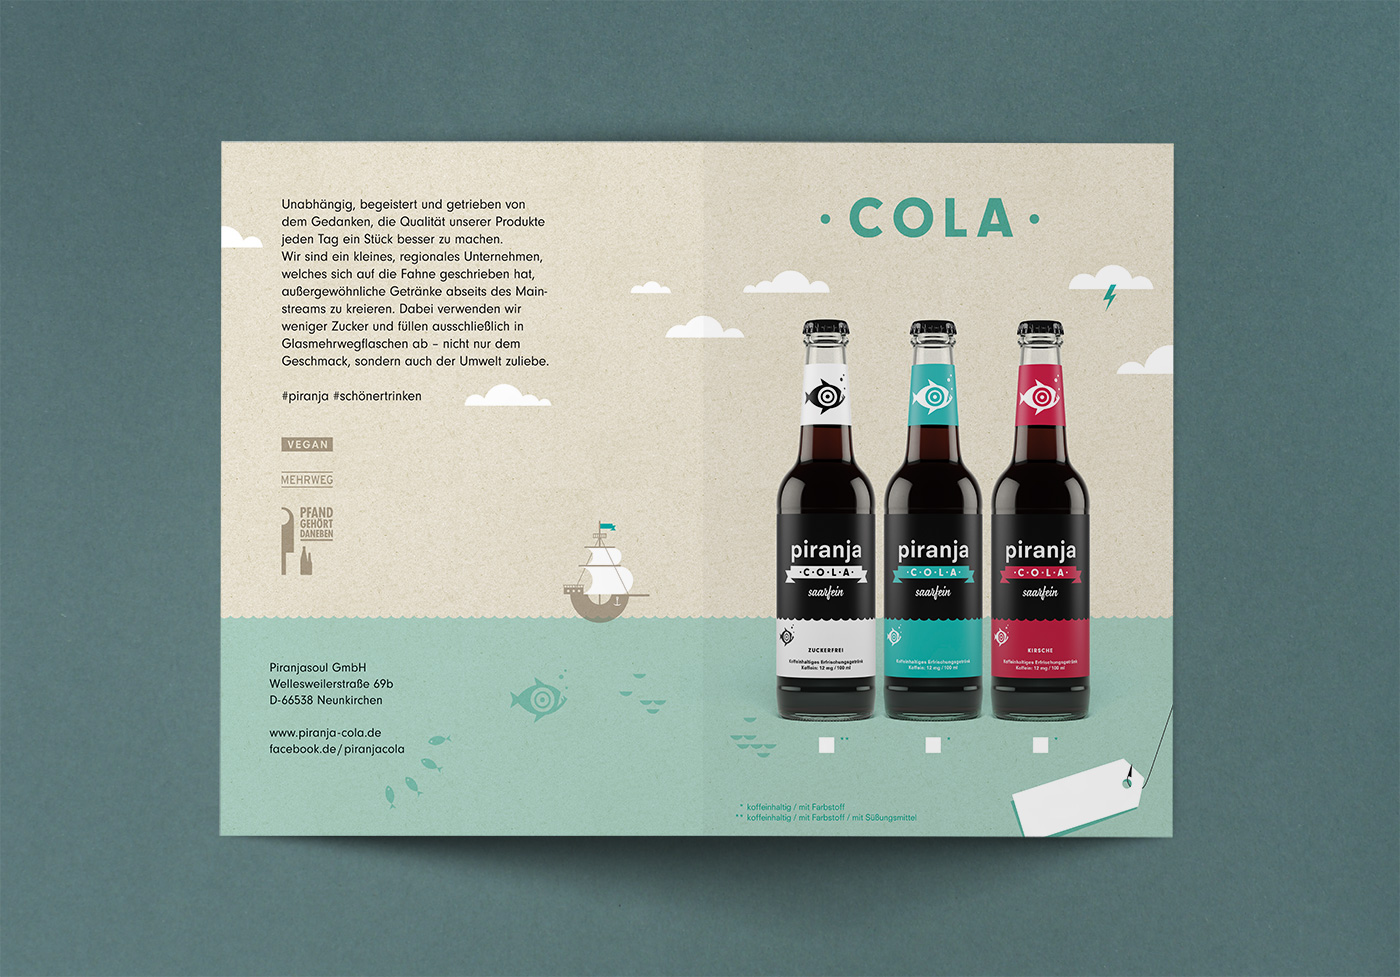 piranja cola cola drink poster Label logo fish chili  coffee limo tea eistee Piranja